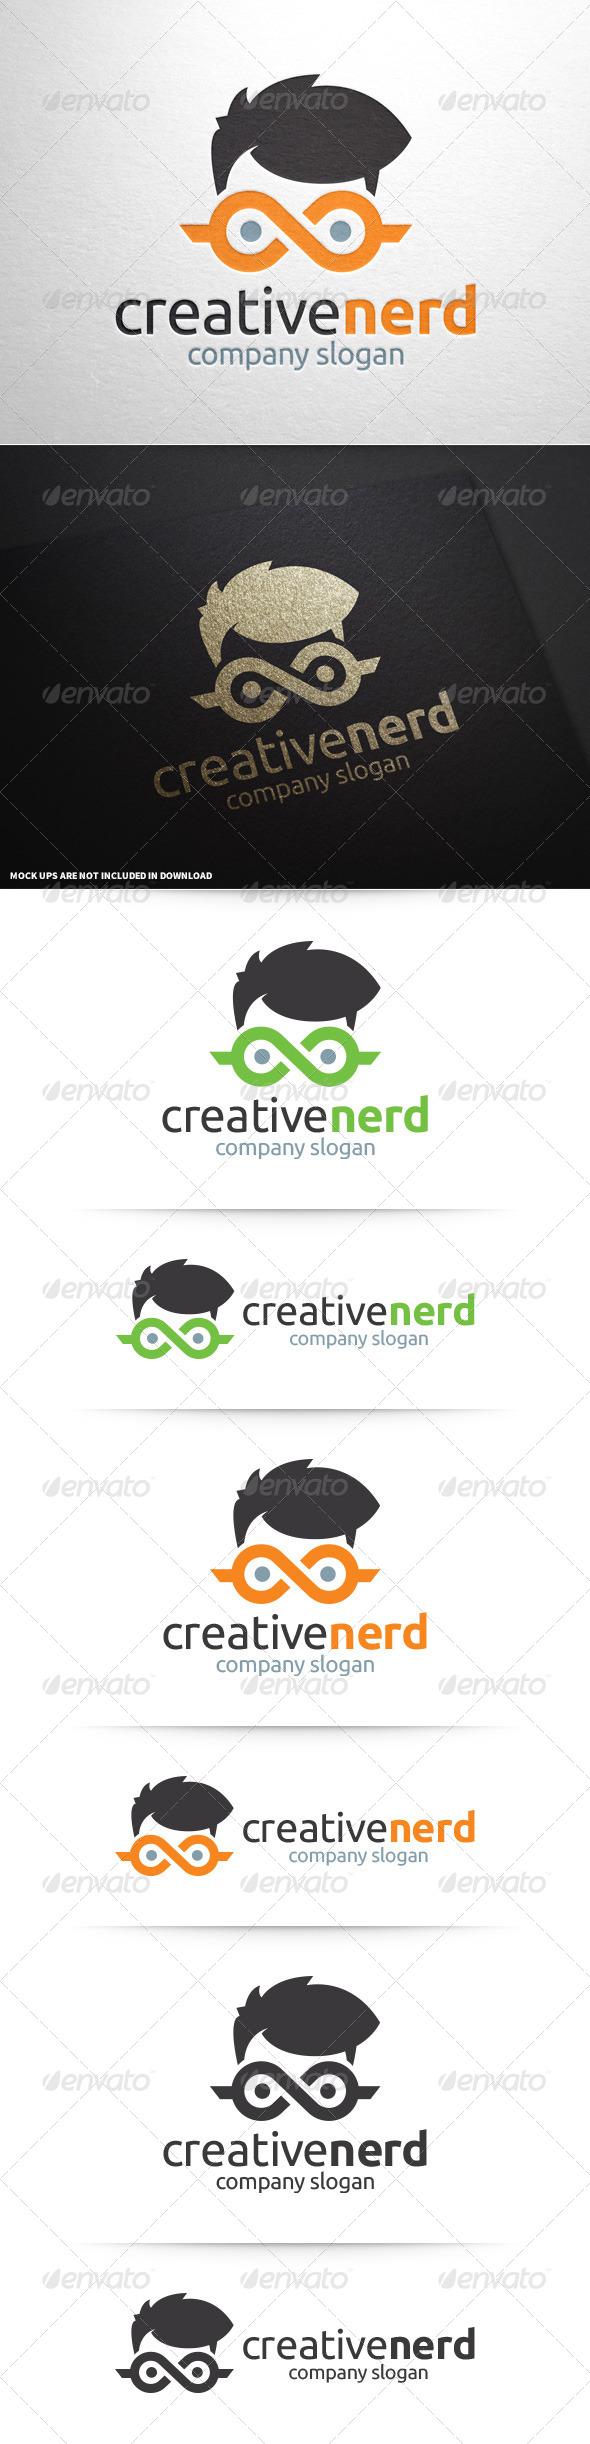 GraphicRiver Creative Nerd Logo Template 8656883